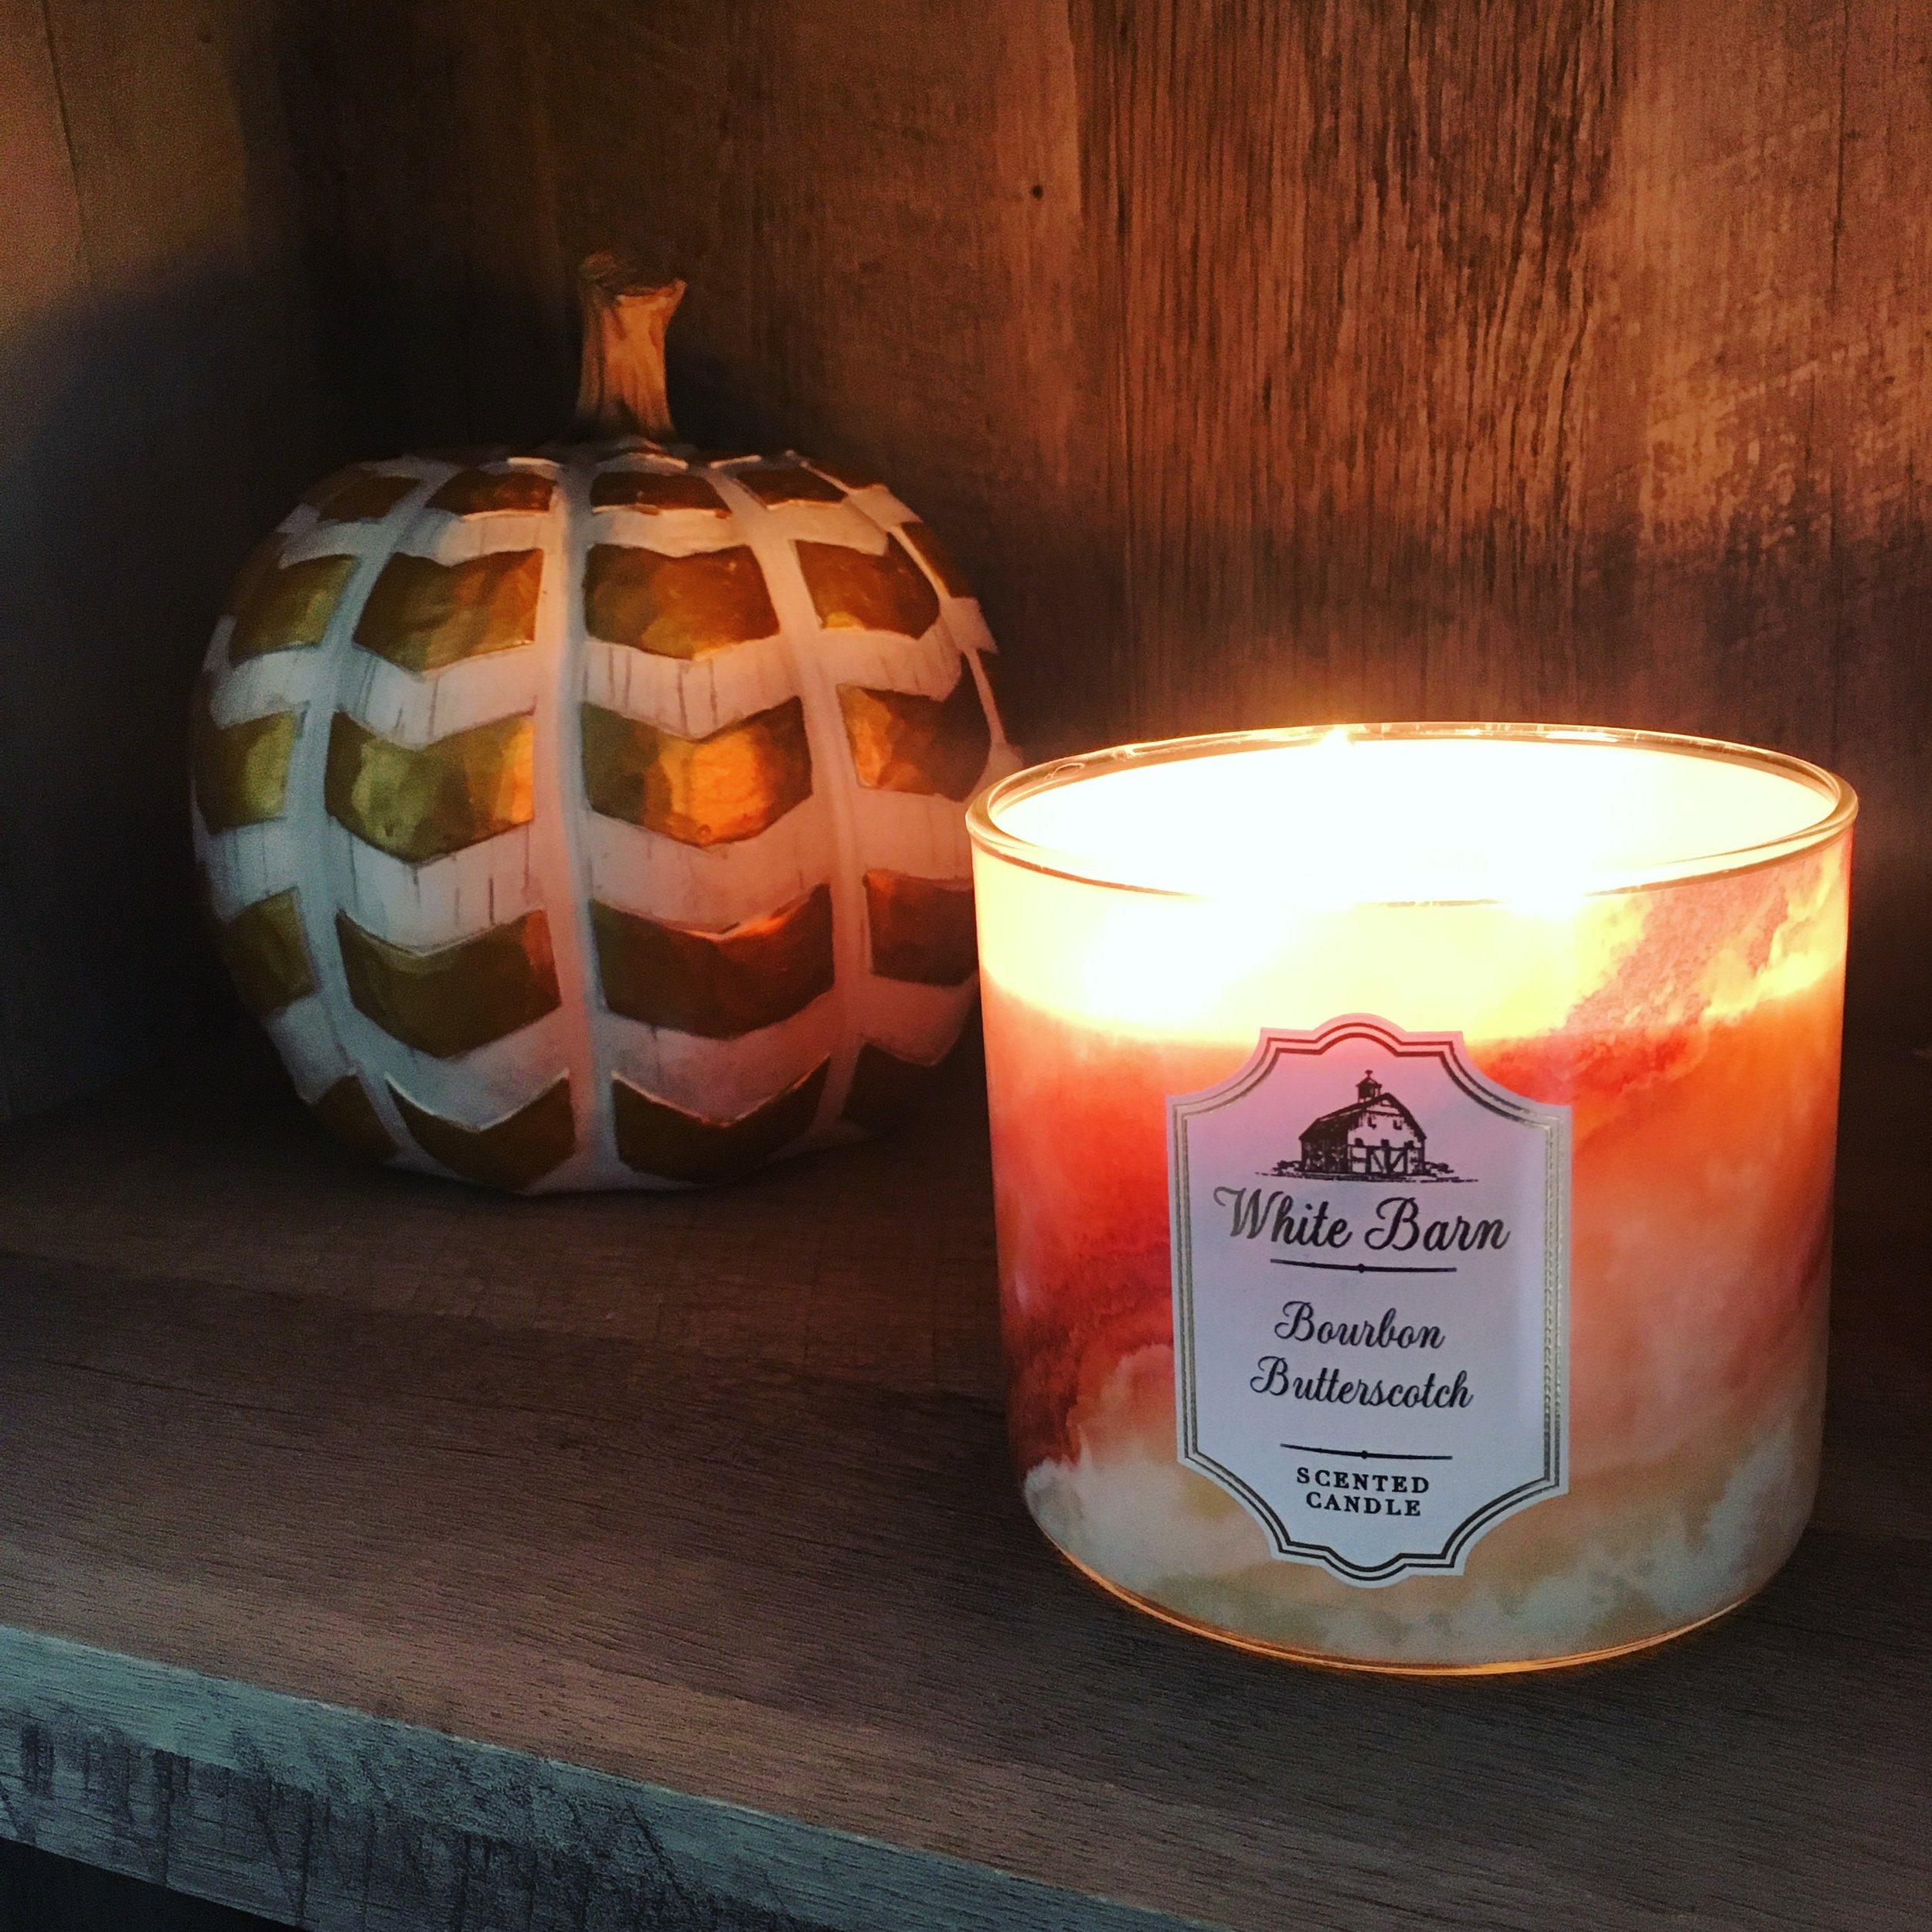 bourbon butterscotch white barn candle